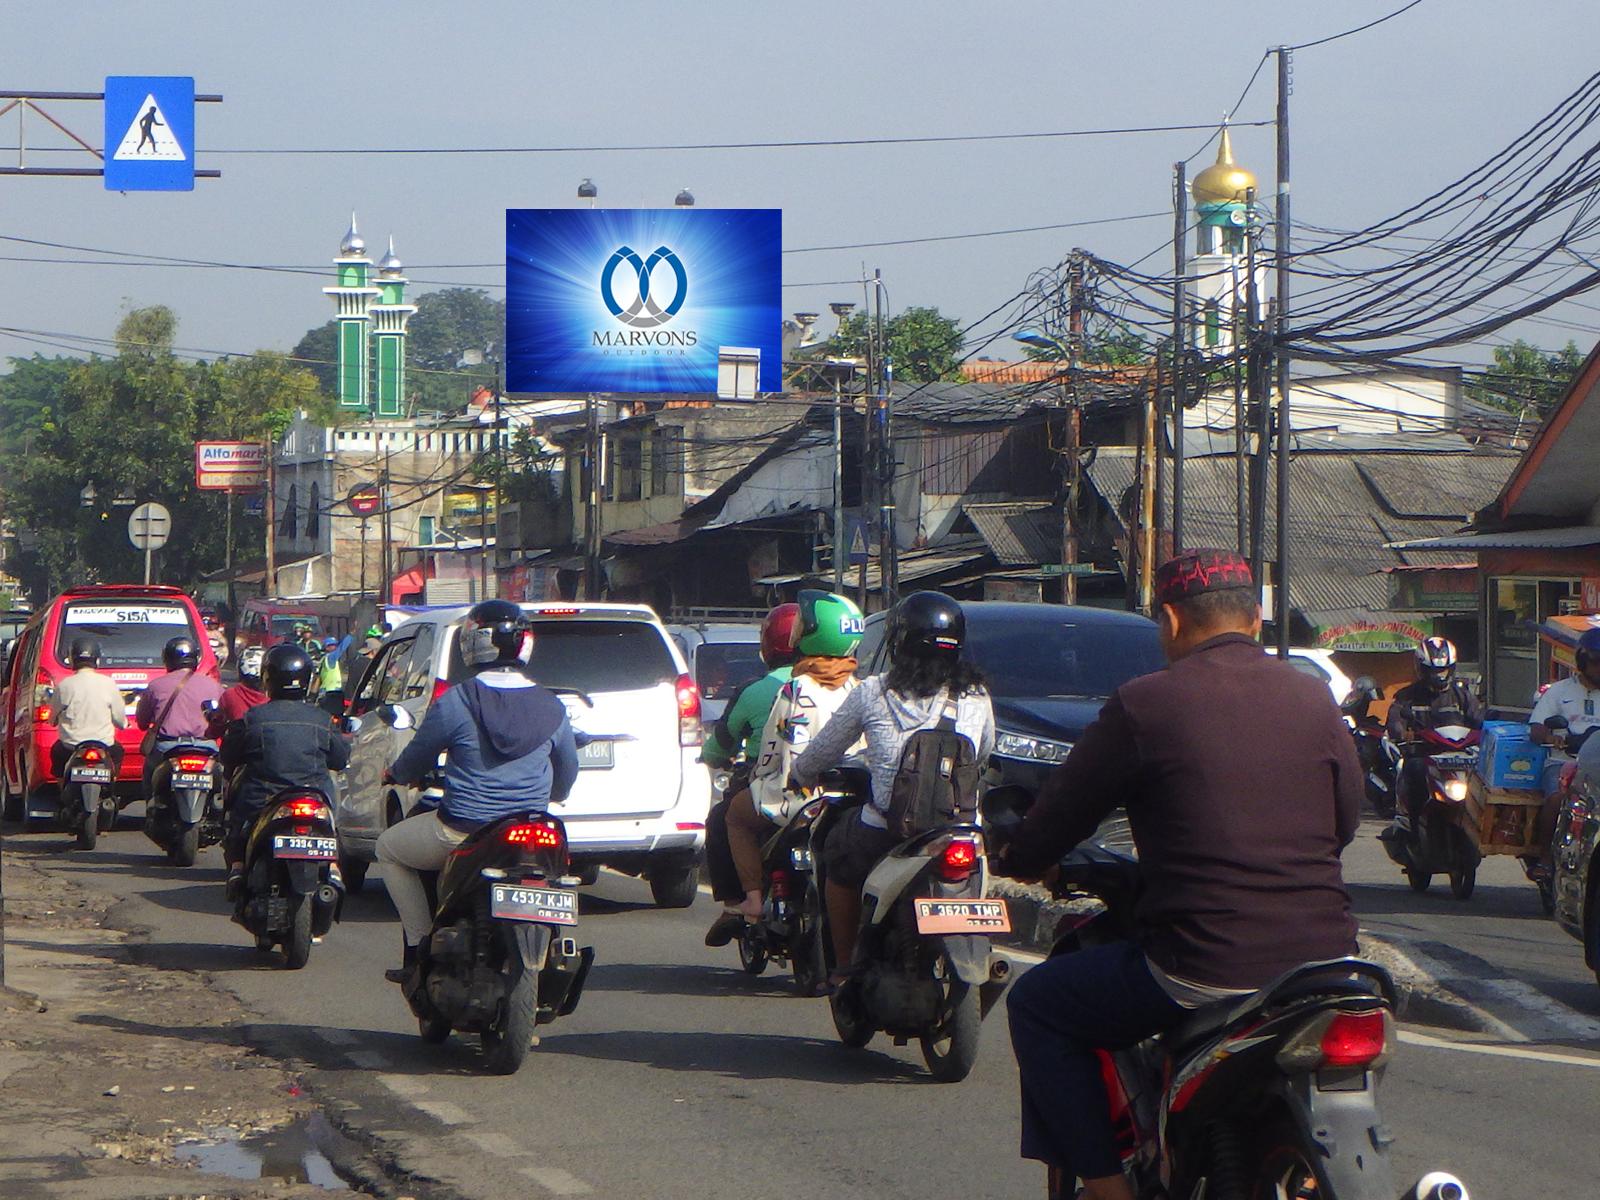 PT. Marvons Media Utama - Pondok Gede - Tamini Square (MV 070) - 4 m x 6 m x 2 mk Horizontal